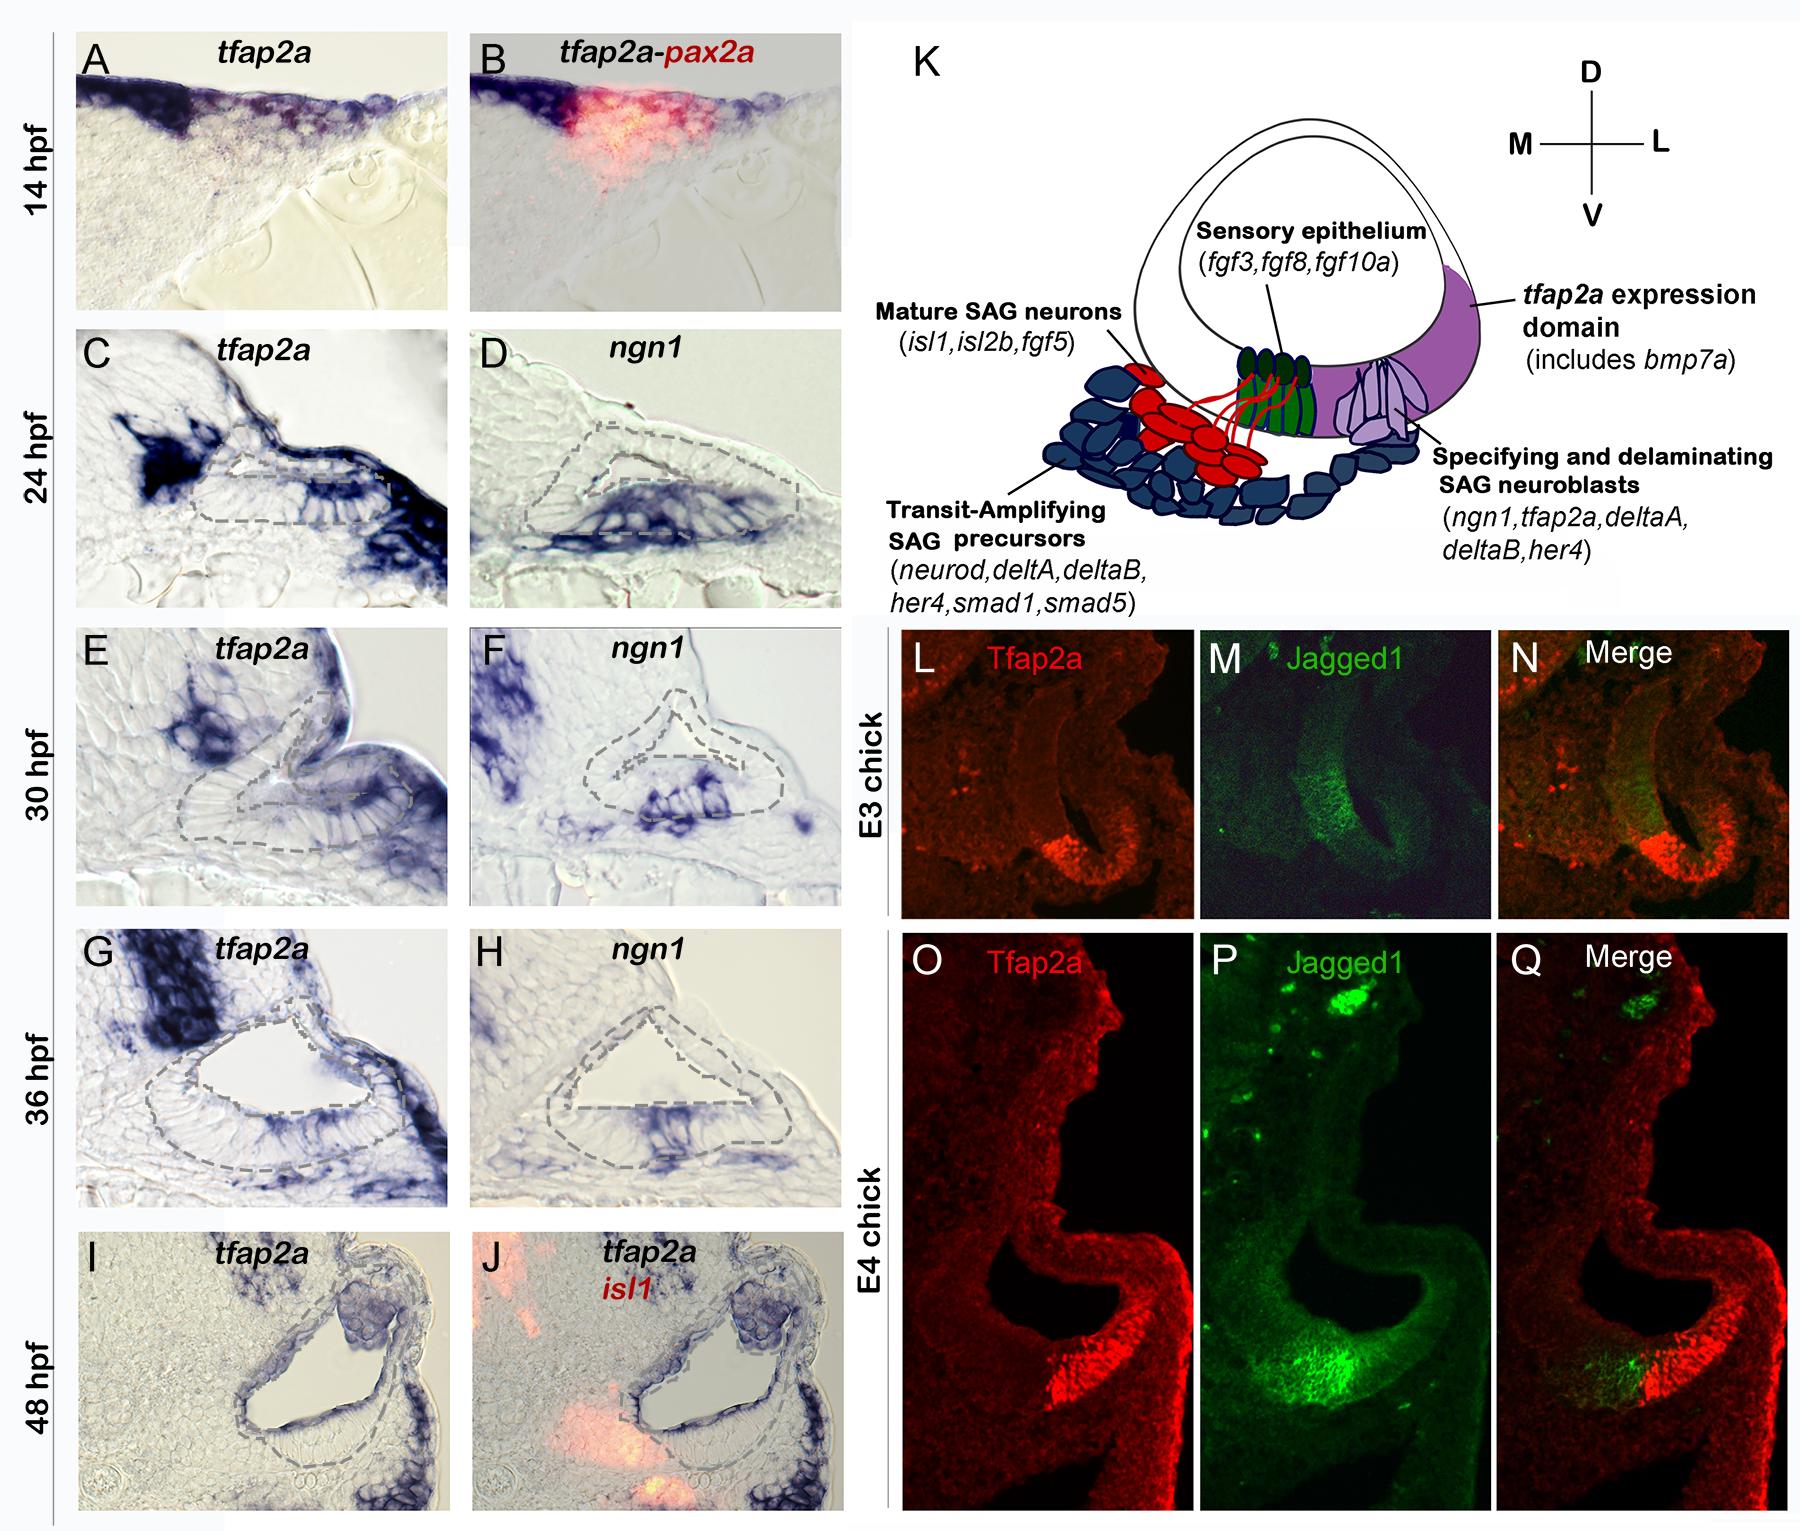 Conserved expression of <i>tfap2a</i> during otic neurogenesis.